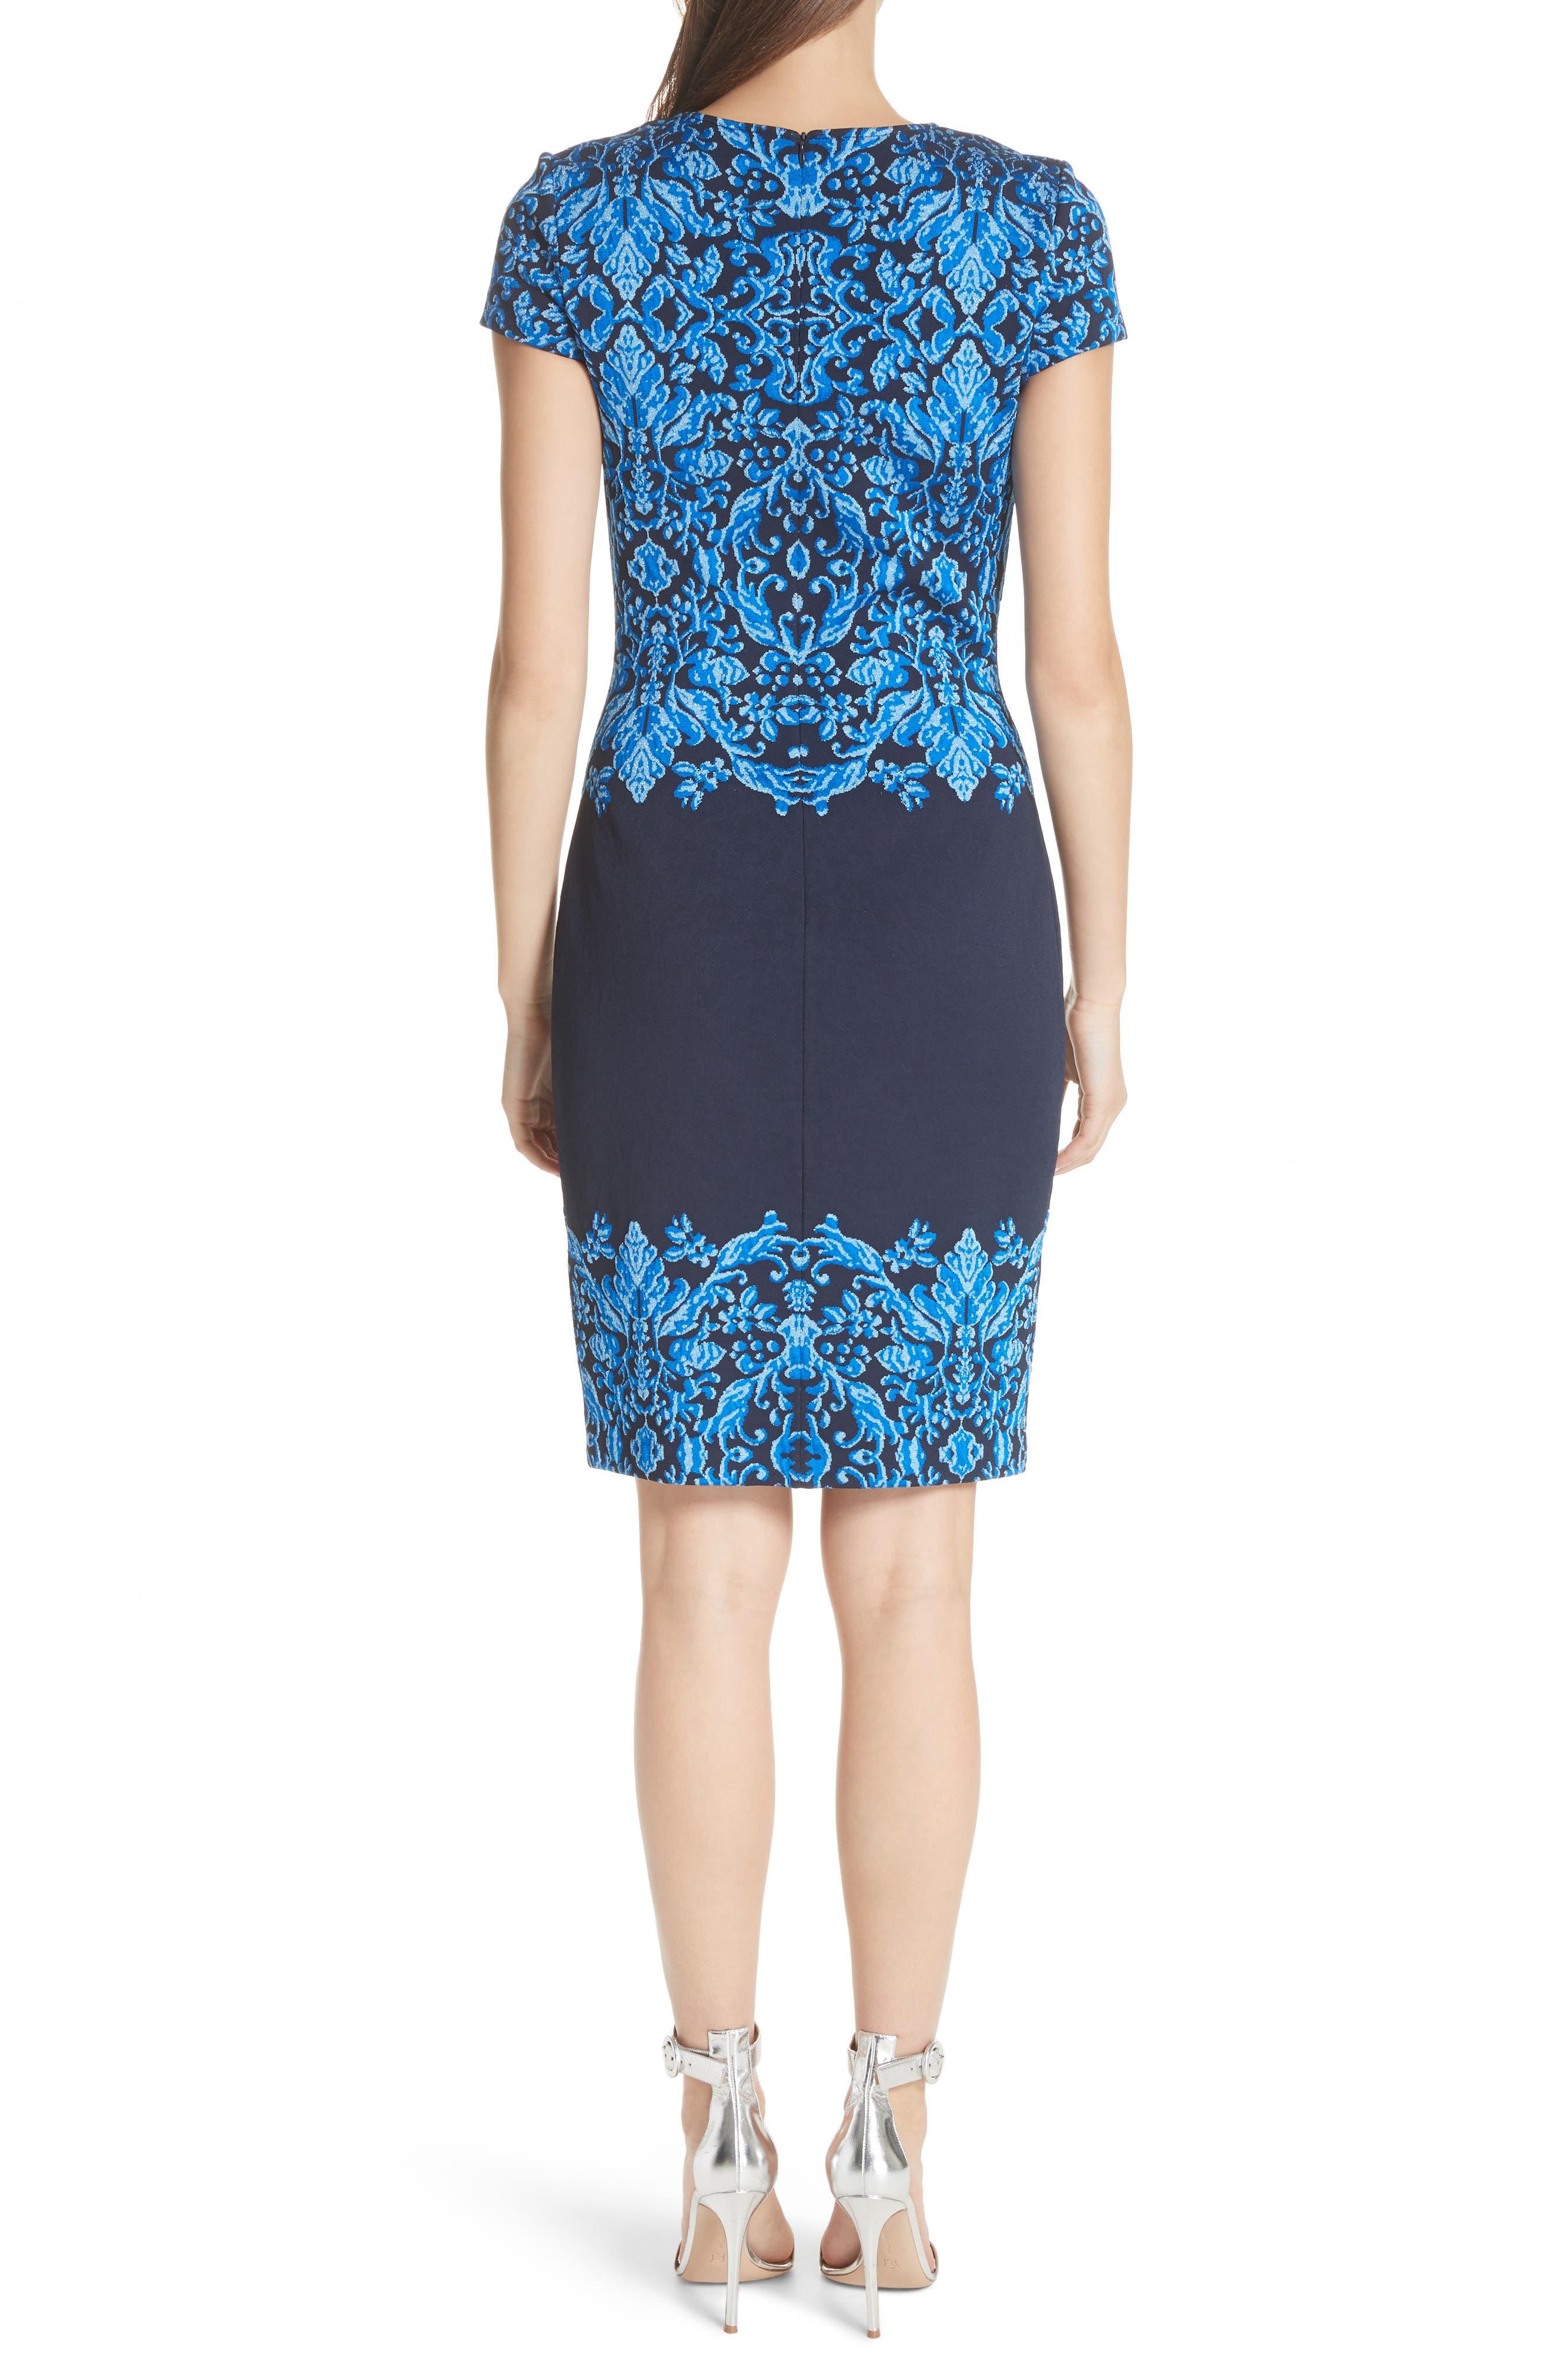 Cool Tones Brocade Knit Dress,                             Alternate thumbnail 2, color,                             Cobalt Multi